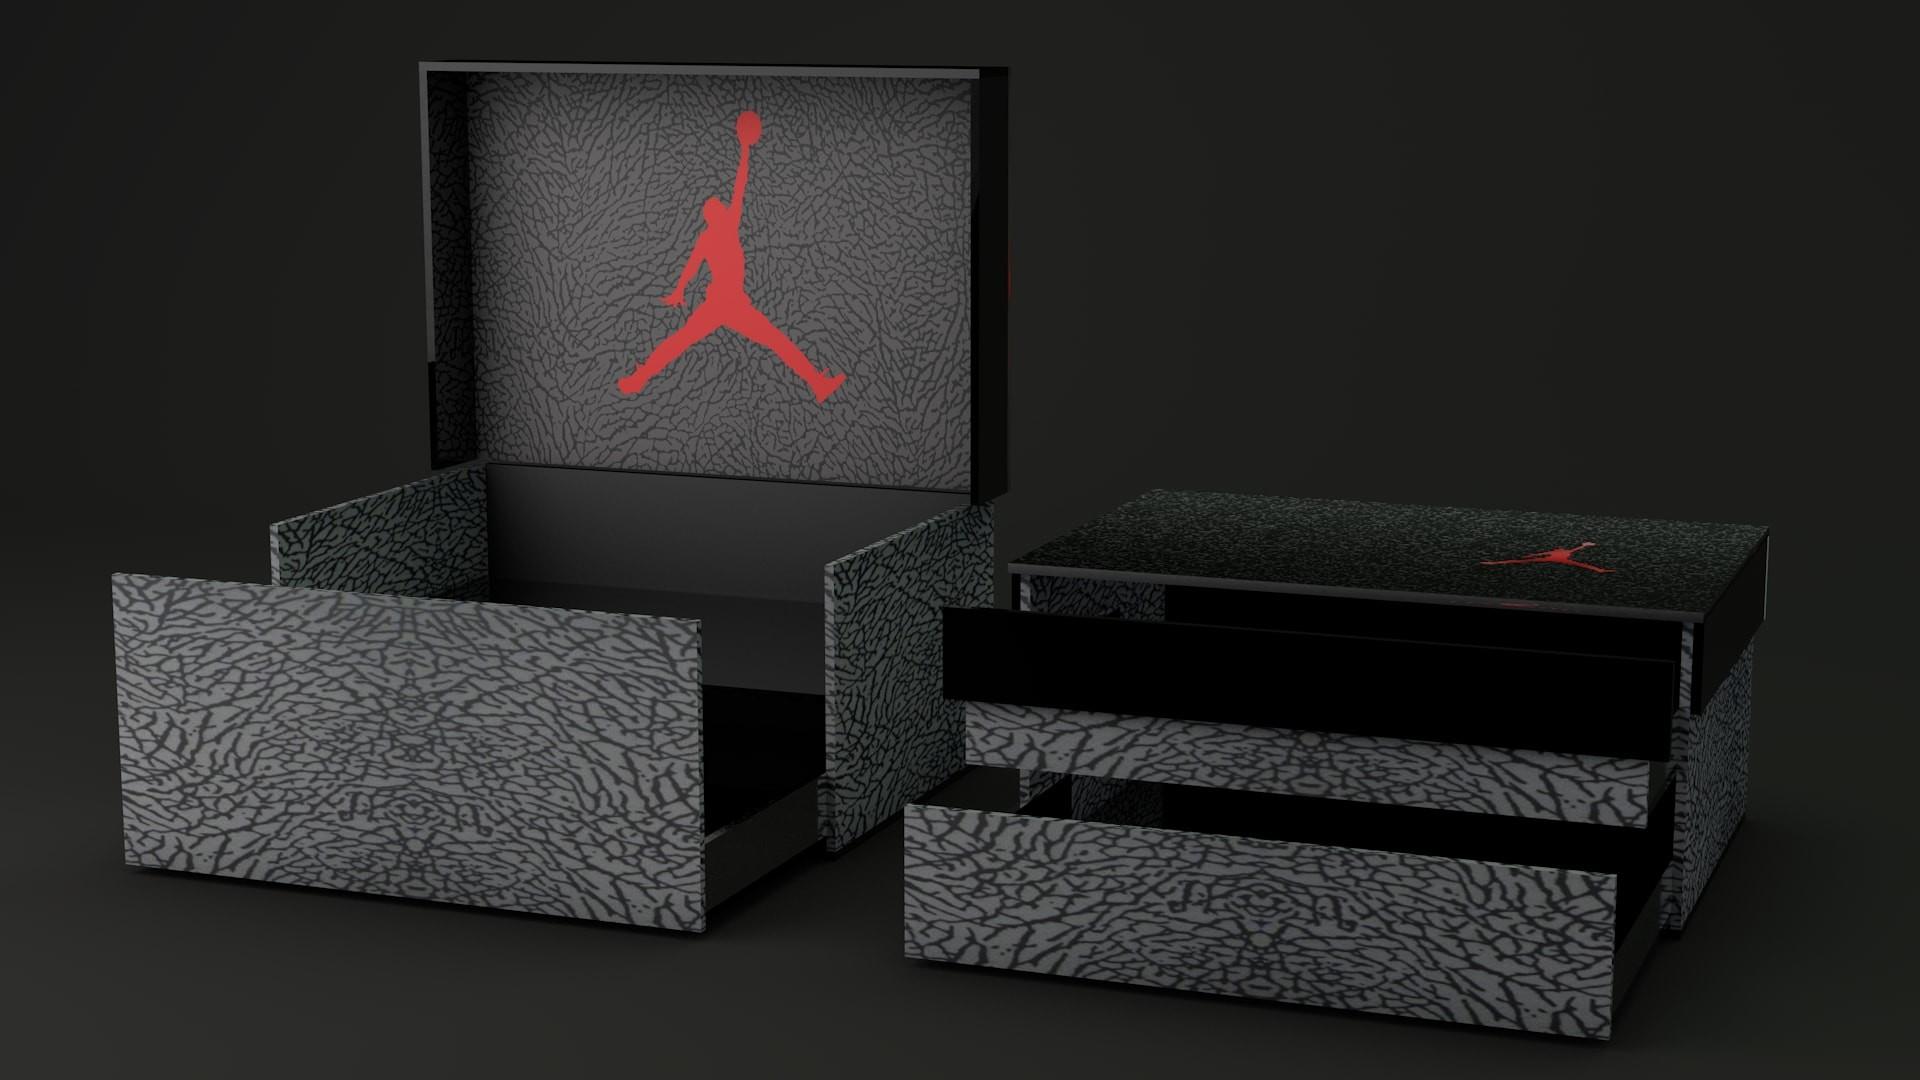 ArtStation - Jordan Shoe Box Storage, Iheb Bouazizi